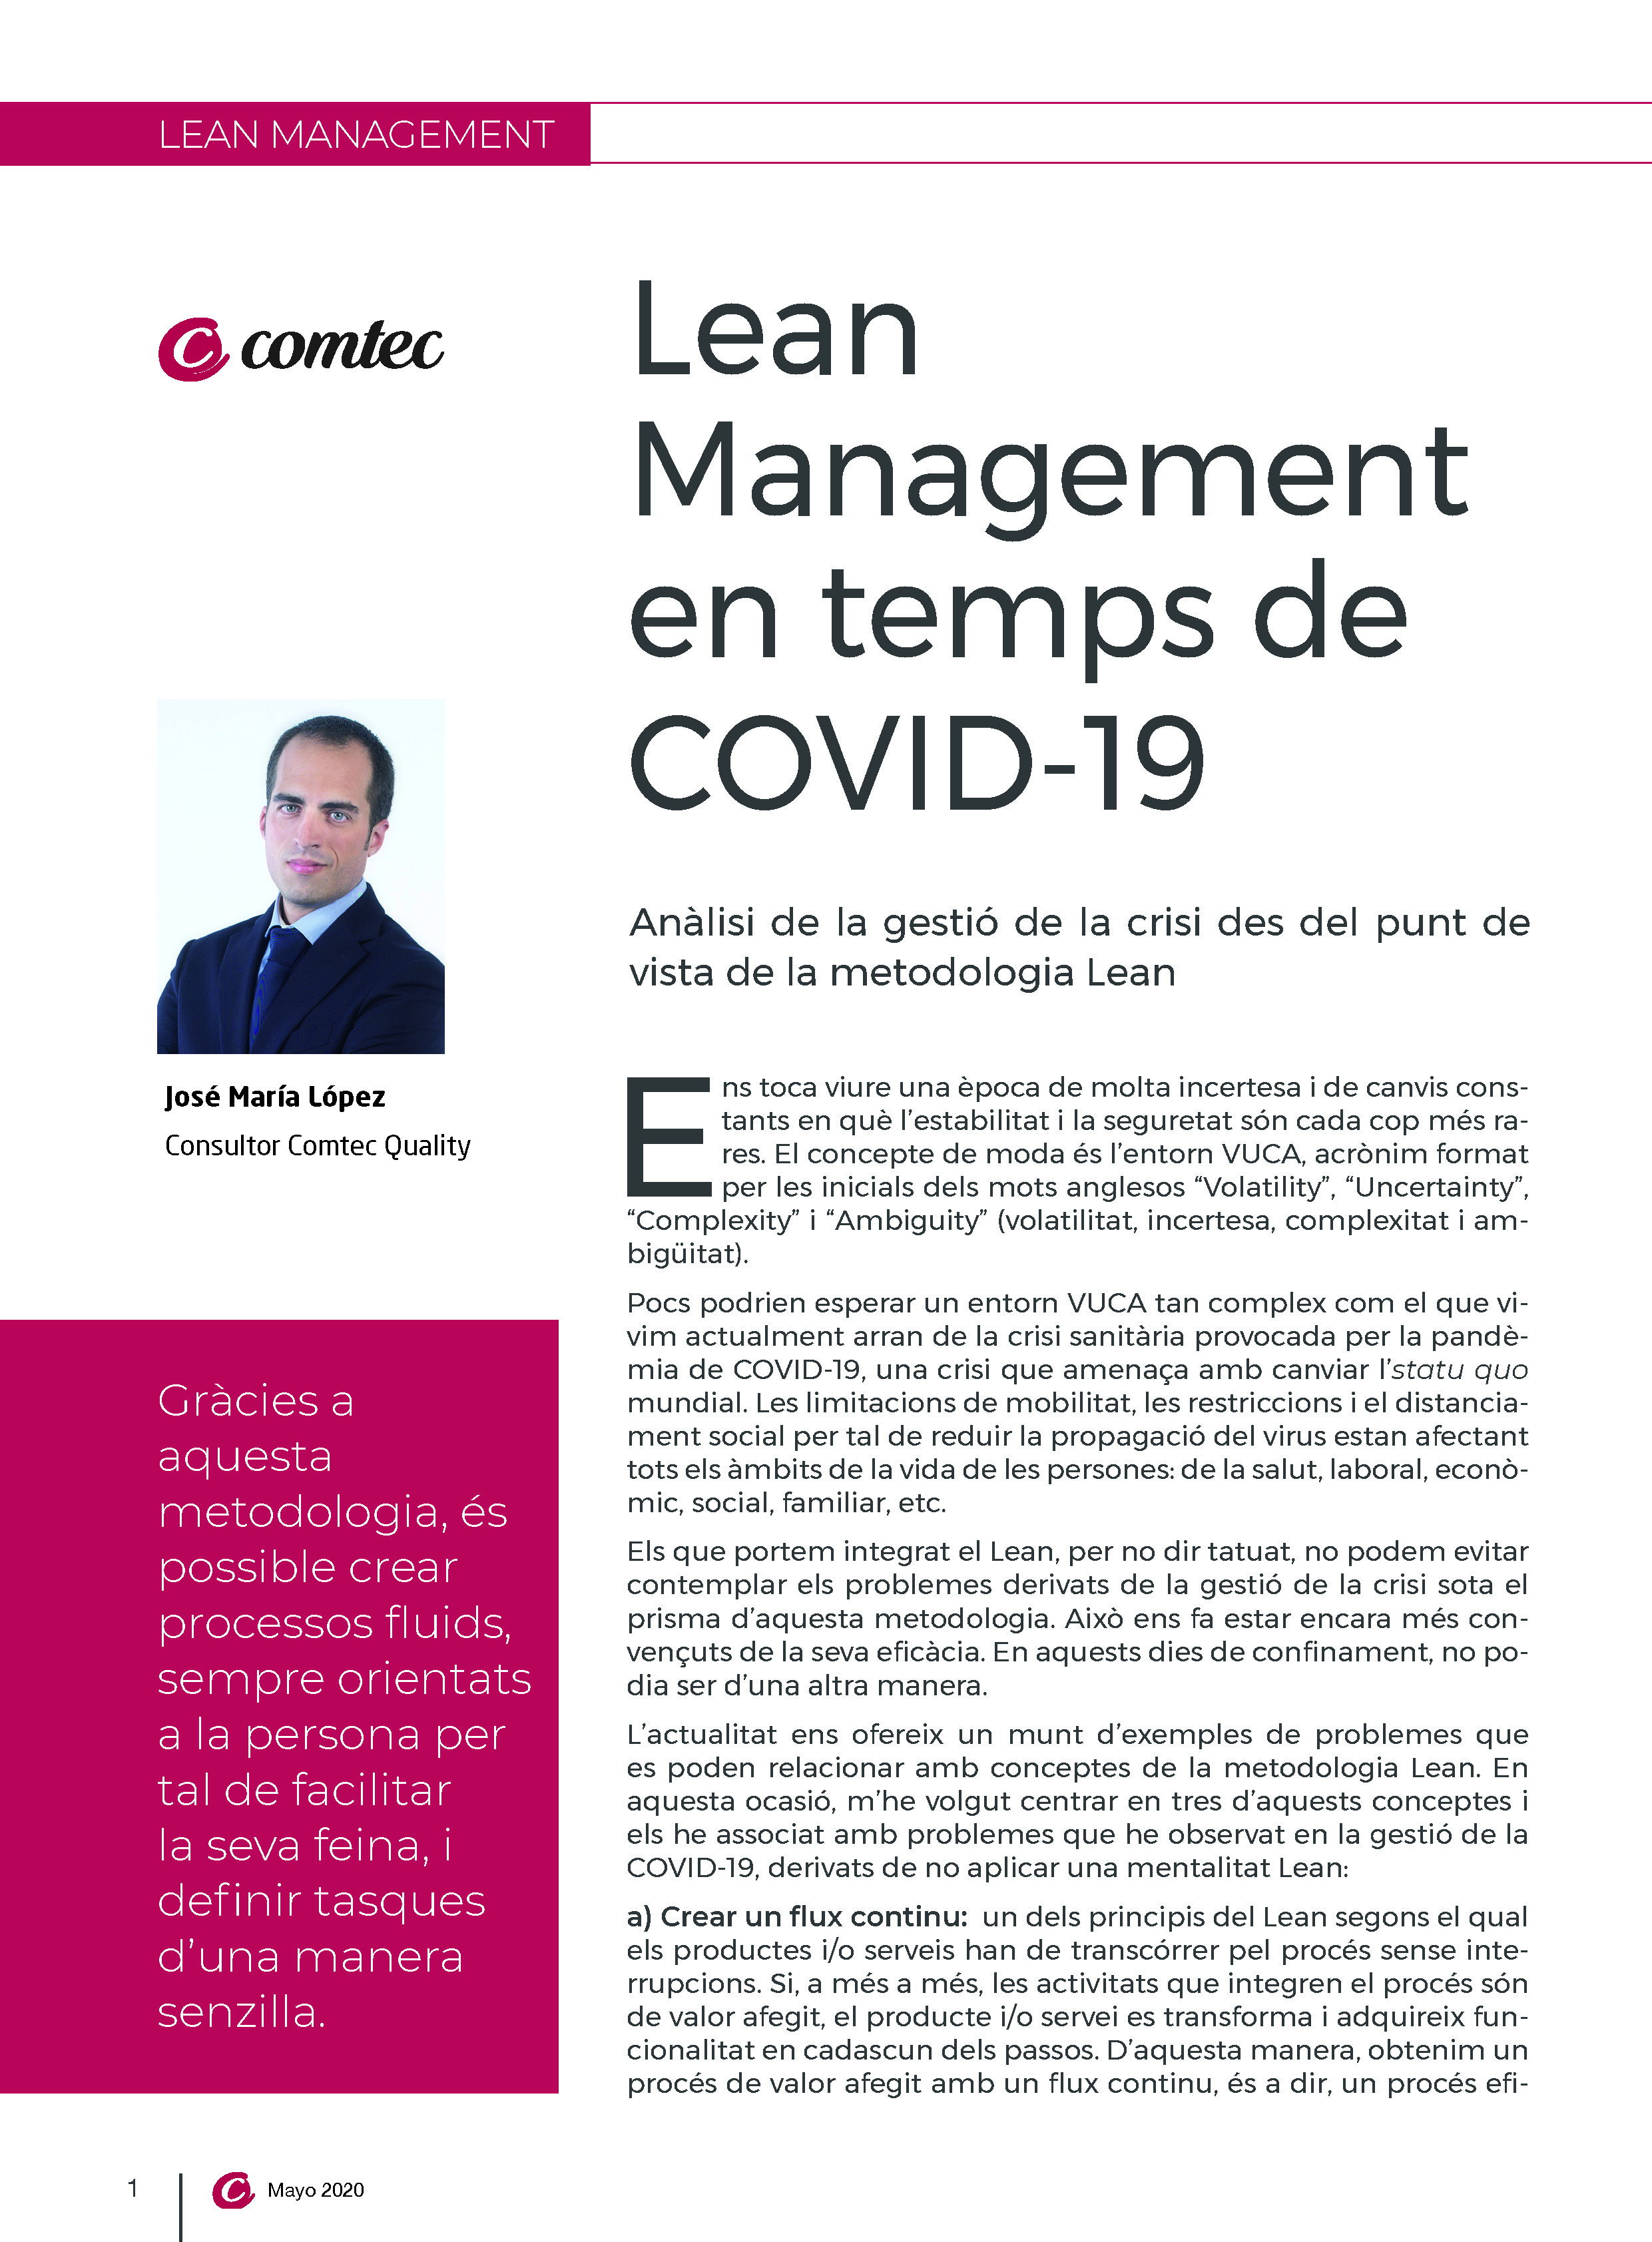 Lean en temps de COVID-19